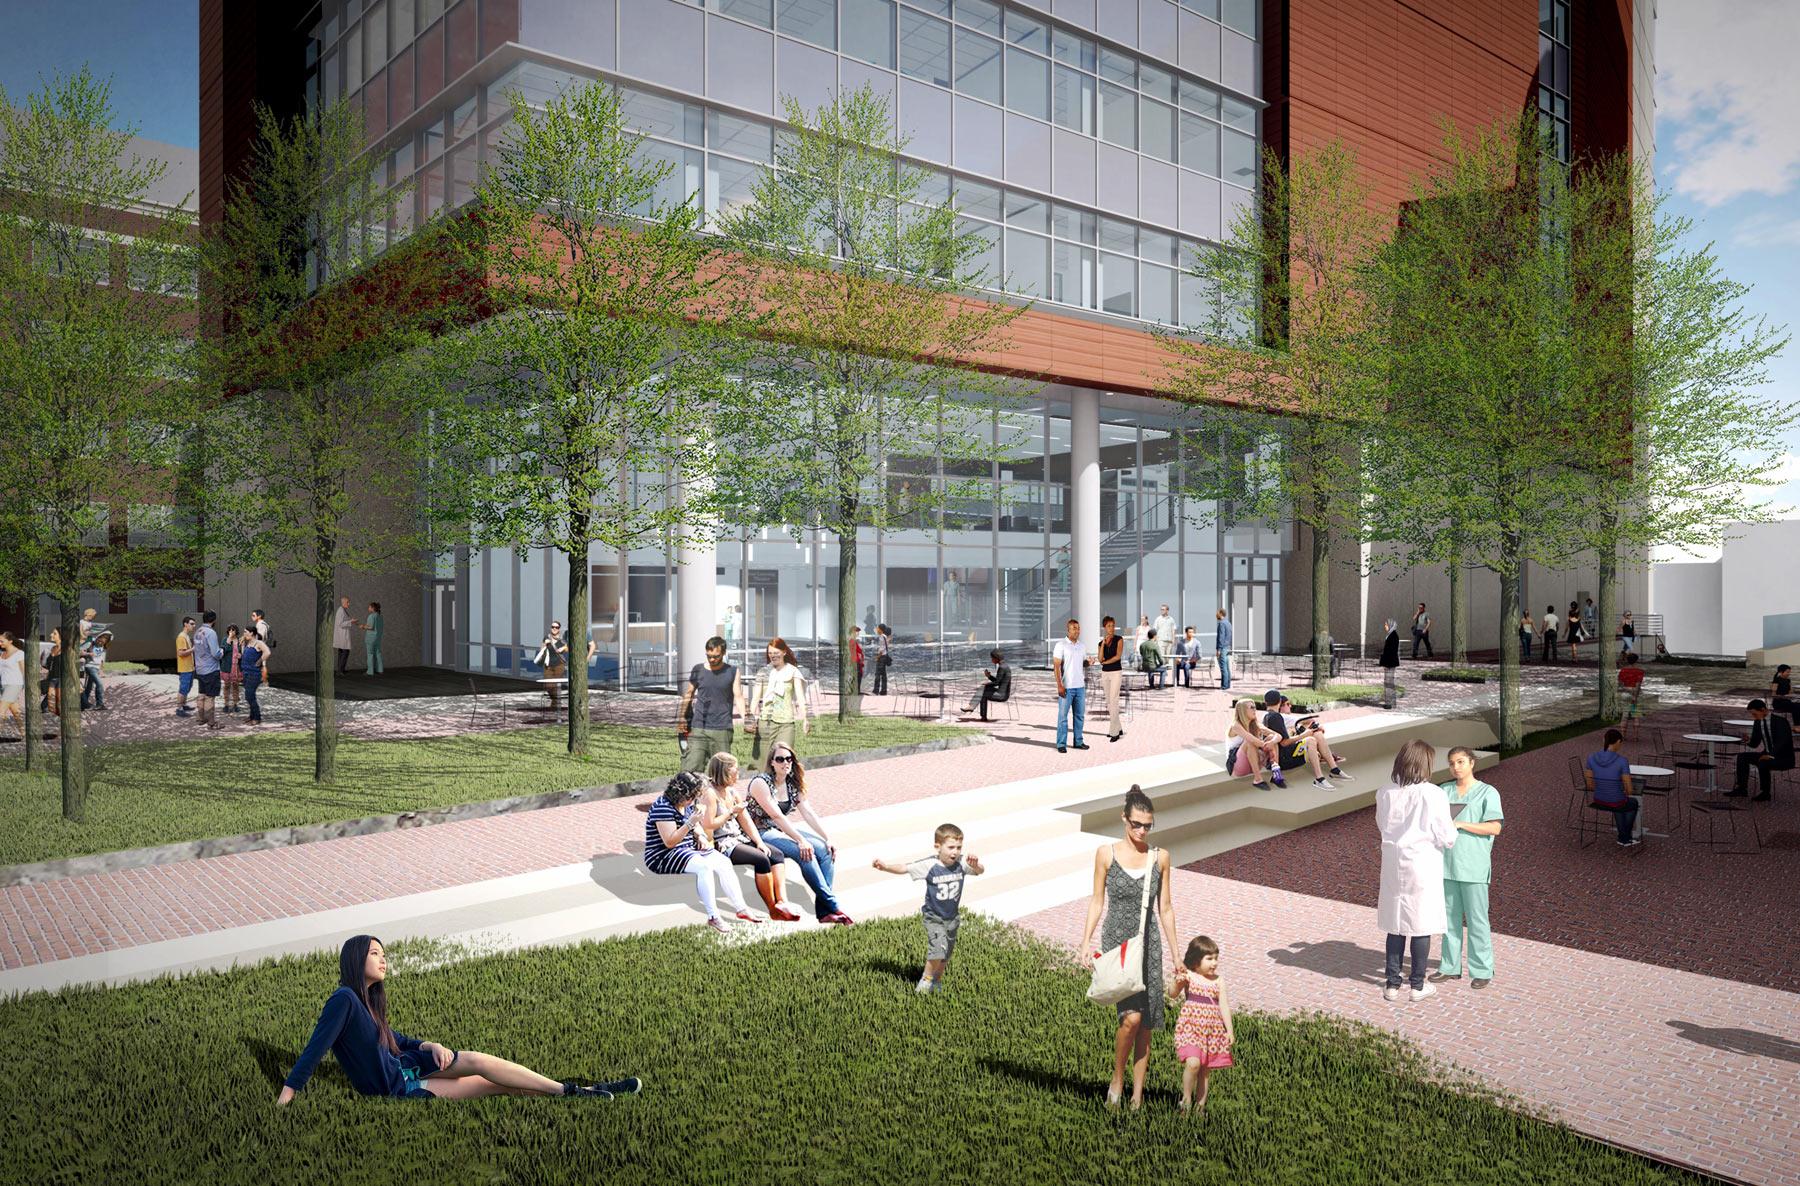 University of North Carolina - Chapel Hill Medical Education Building